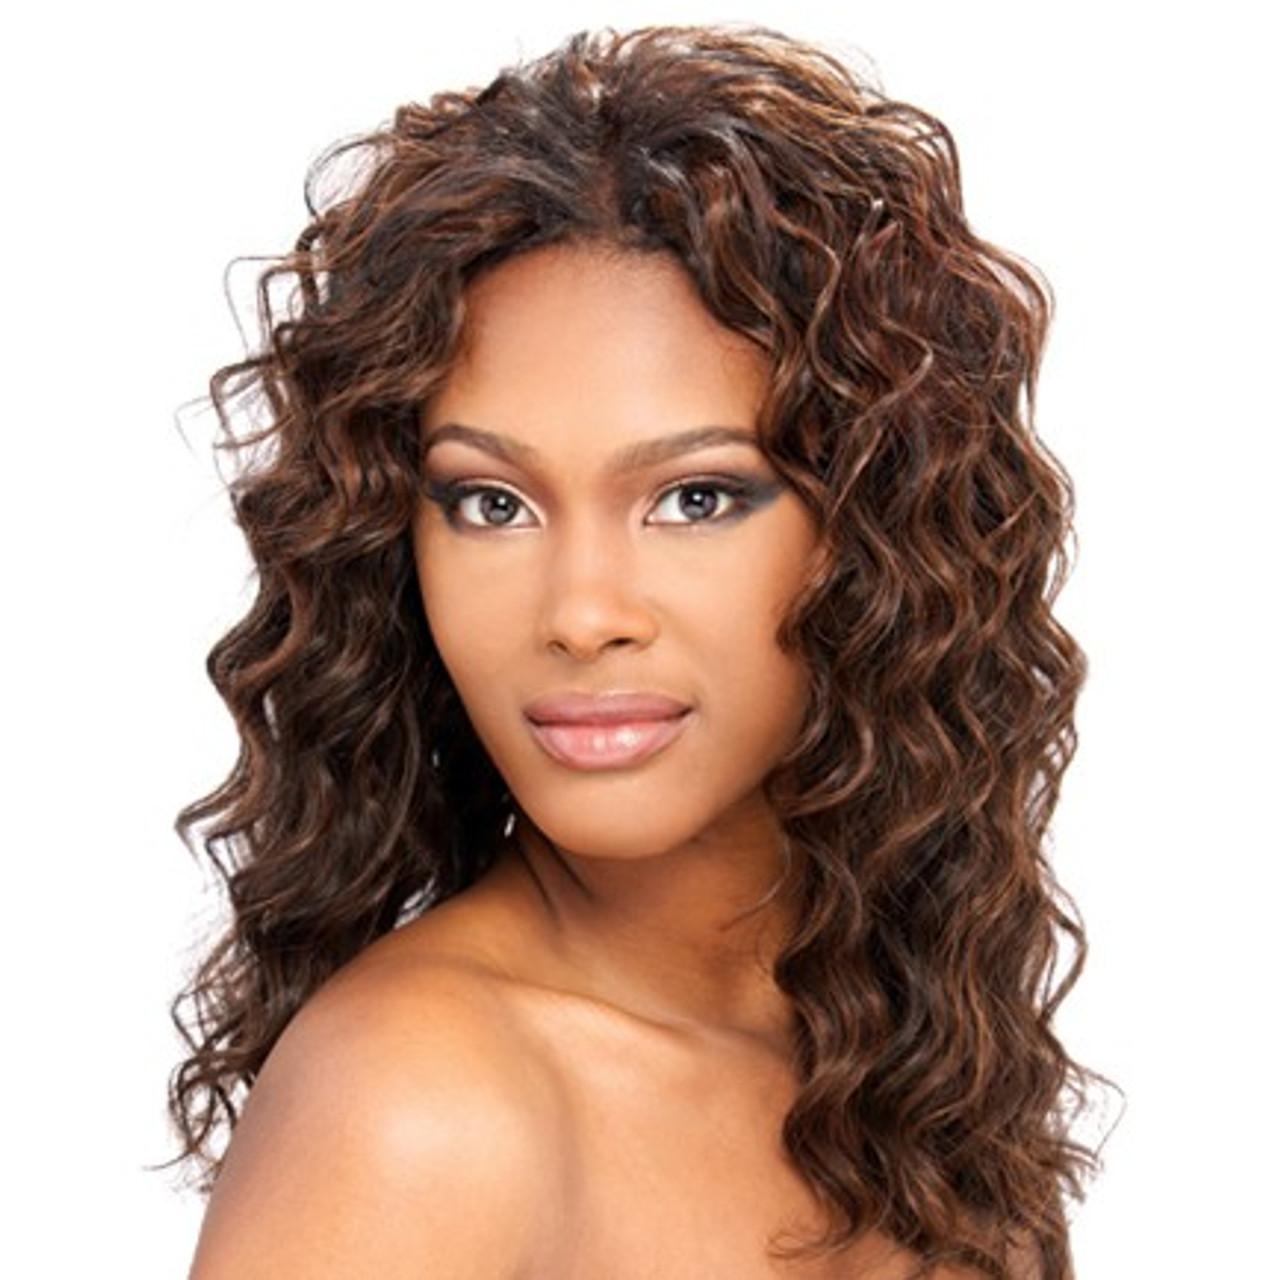 Human Hair Weave Milky Way Que Loose Deep 4pcs Top Hair Wigs